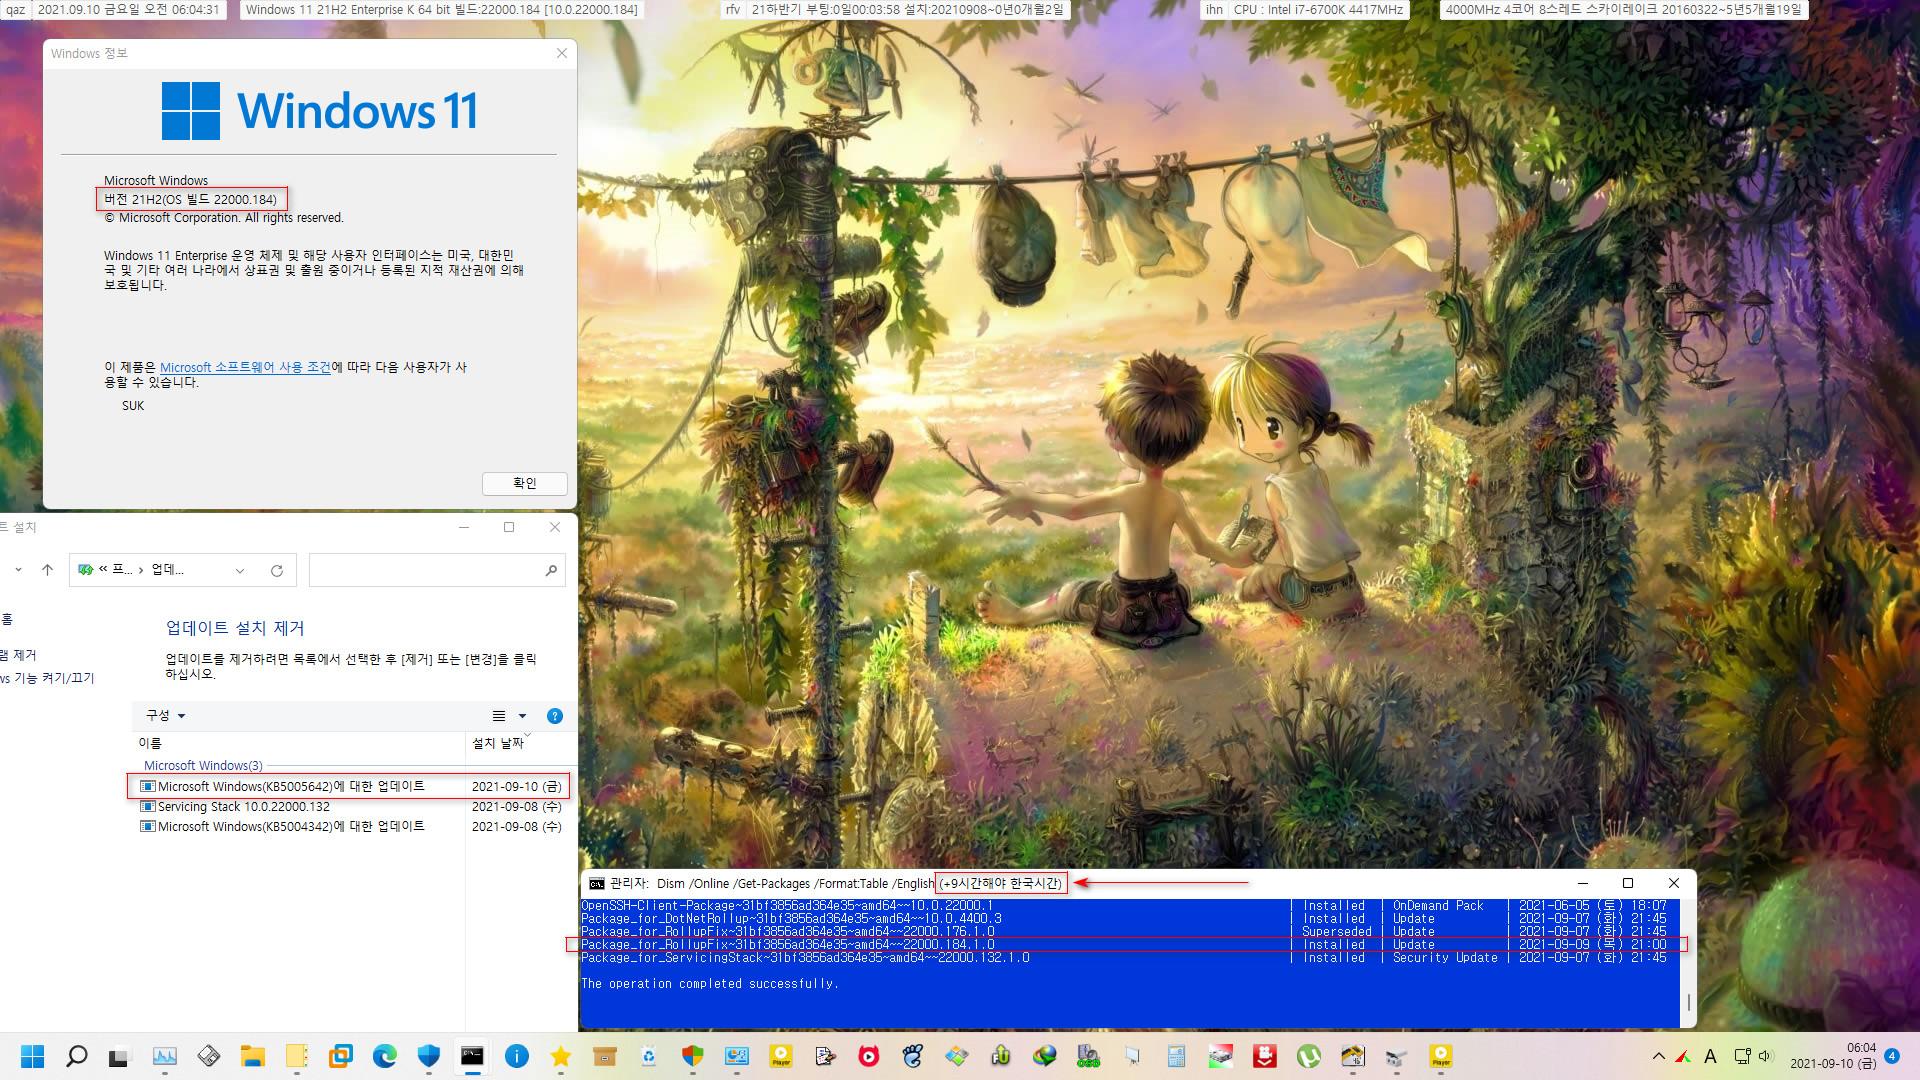 Windows 11 인사이더 프리뷰 - 버전 21H2 (OS 빌드 22000.184) 나왔네요 - 베타 채널 + 릴리스 프리뷰 채널 - 실컴에 업데이트 설치했습니다 - 재부팅 후 2021-09-10_060431.jpg